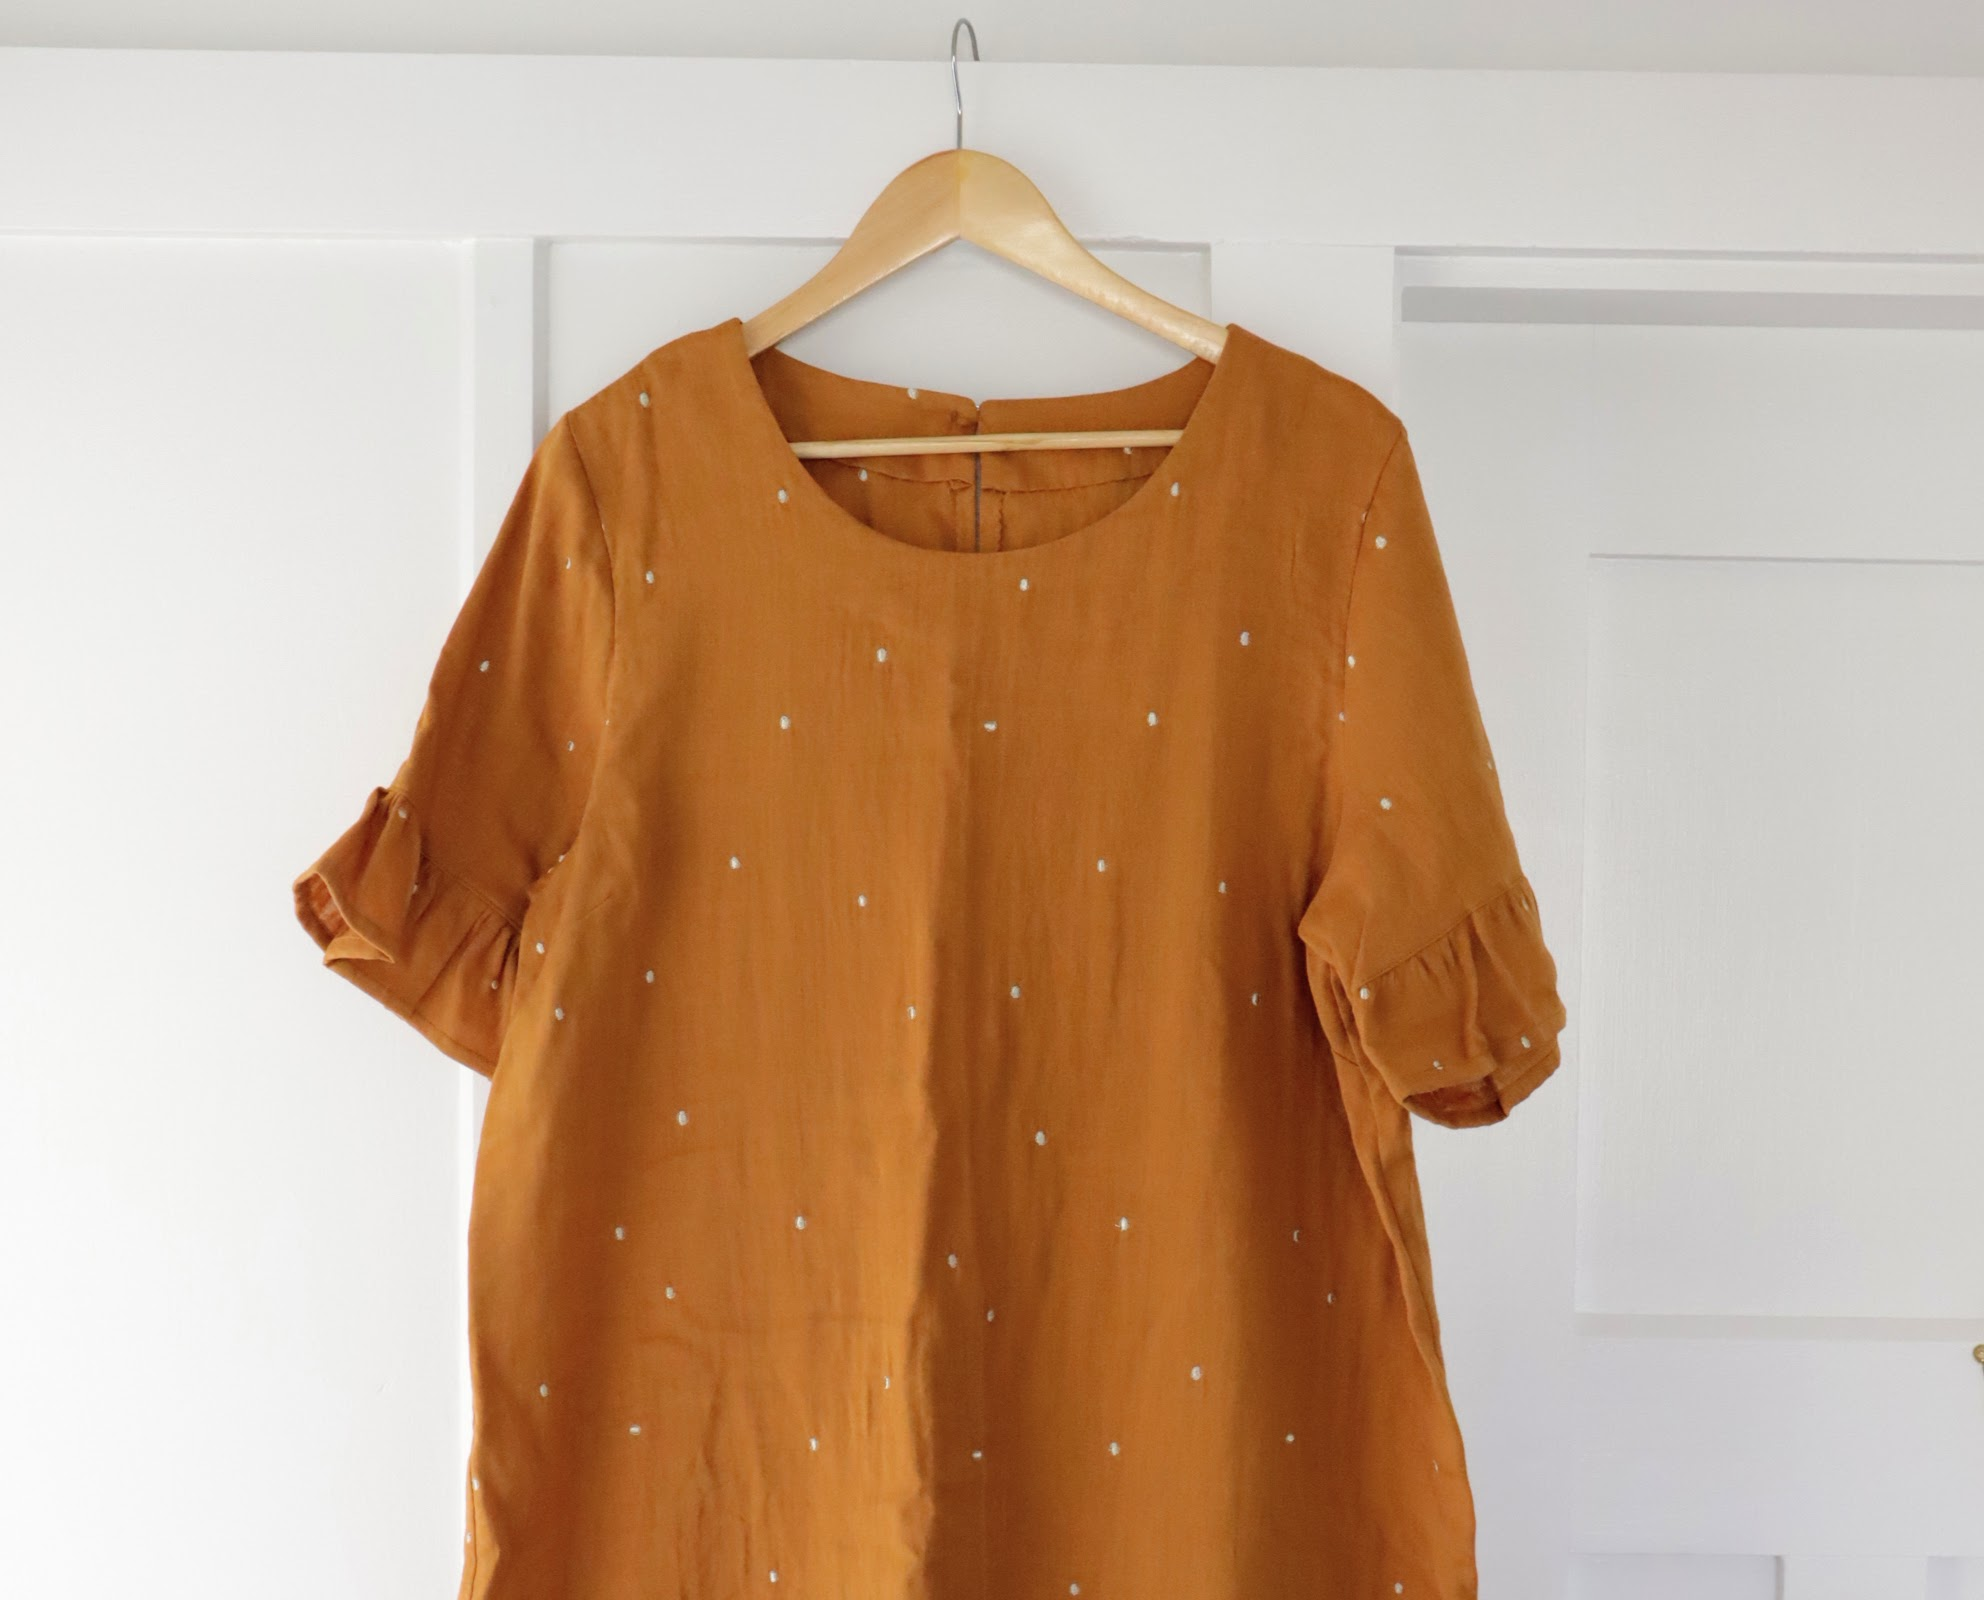 How to sew enclosed neckline facing